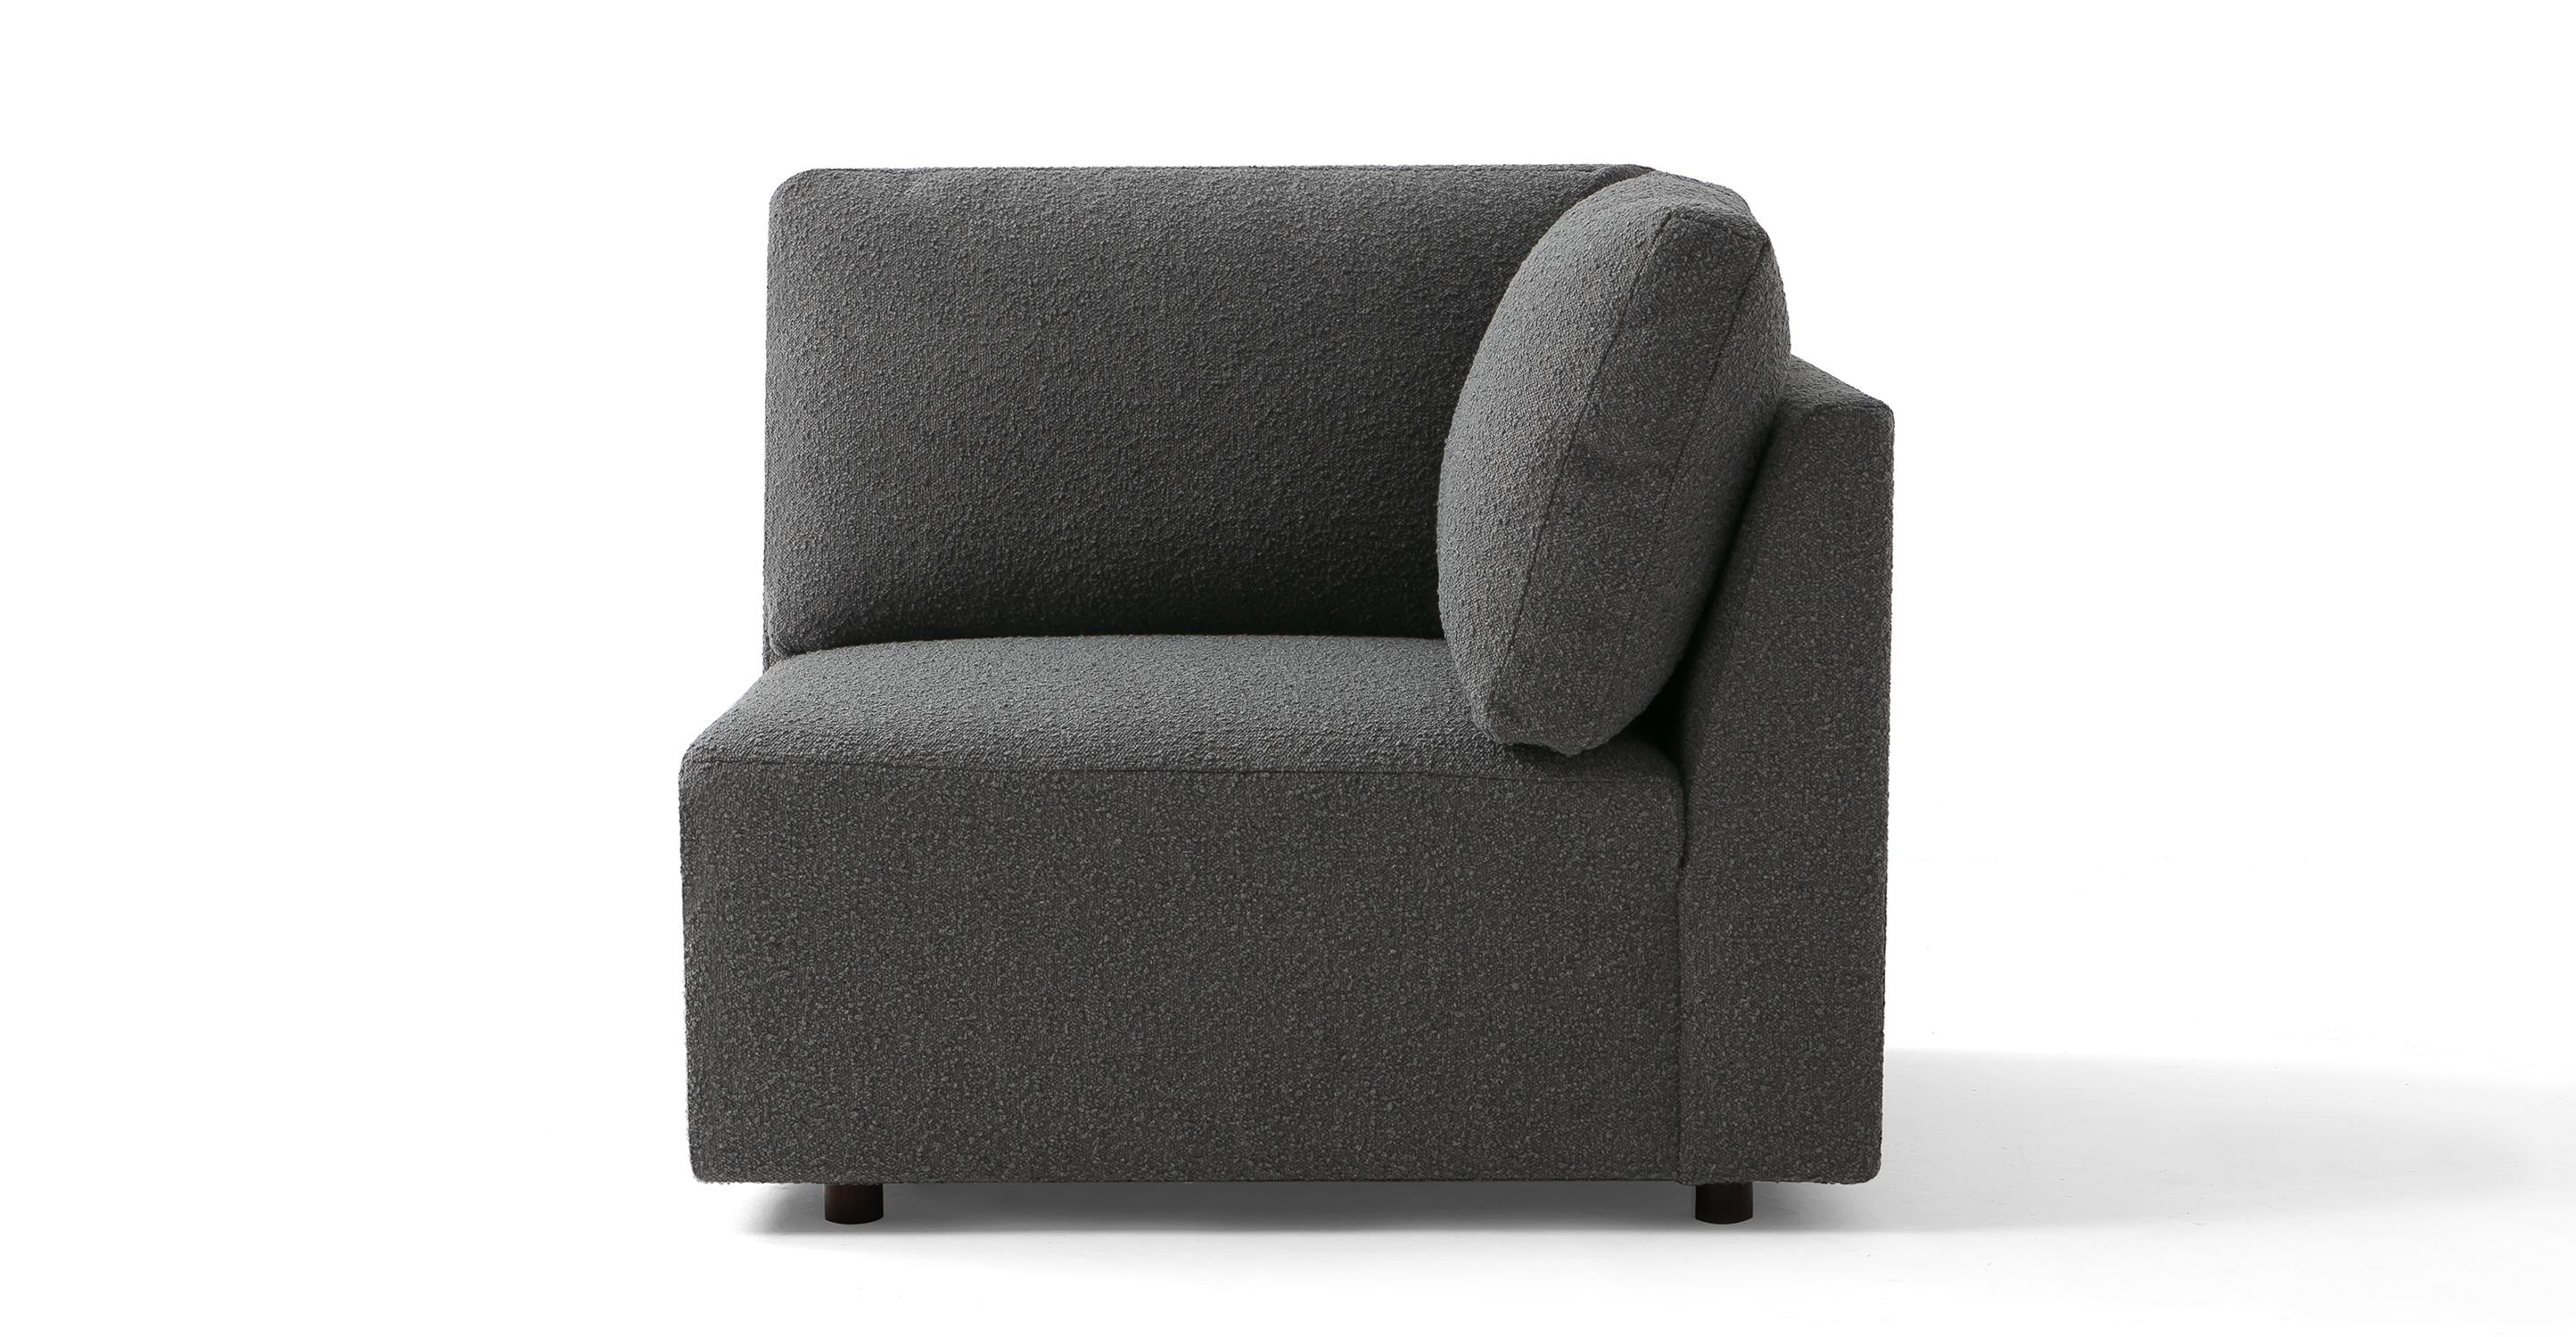 "Domus 39"" Fabric Corner Seat Sofa, Gris Boucle"